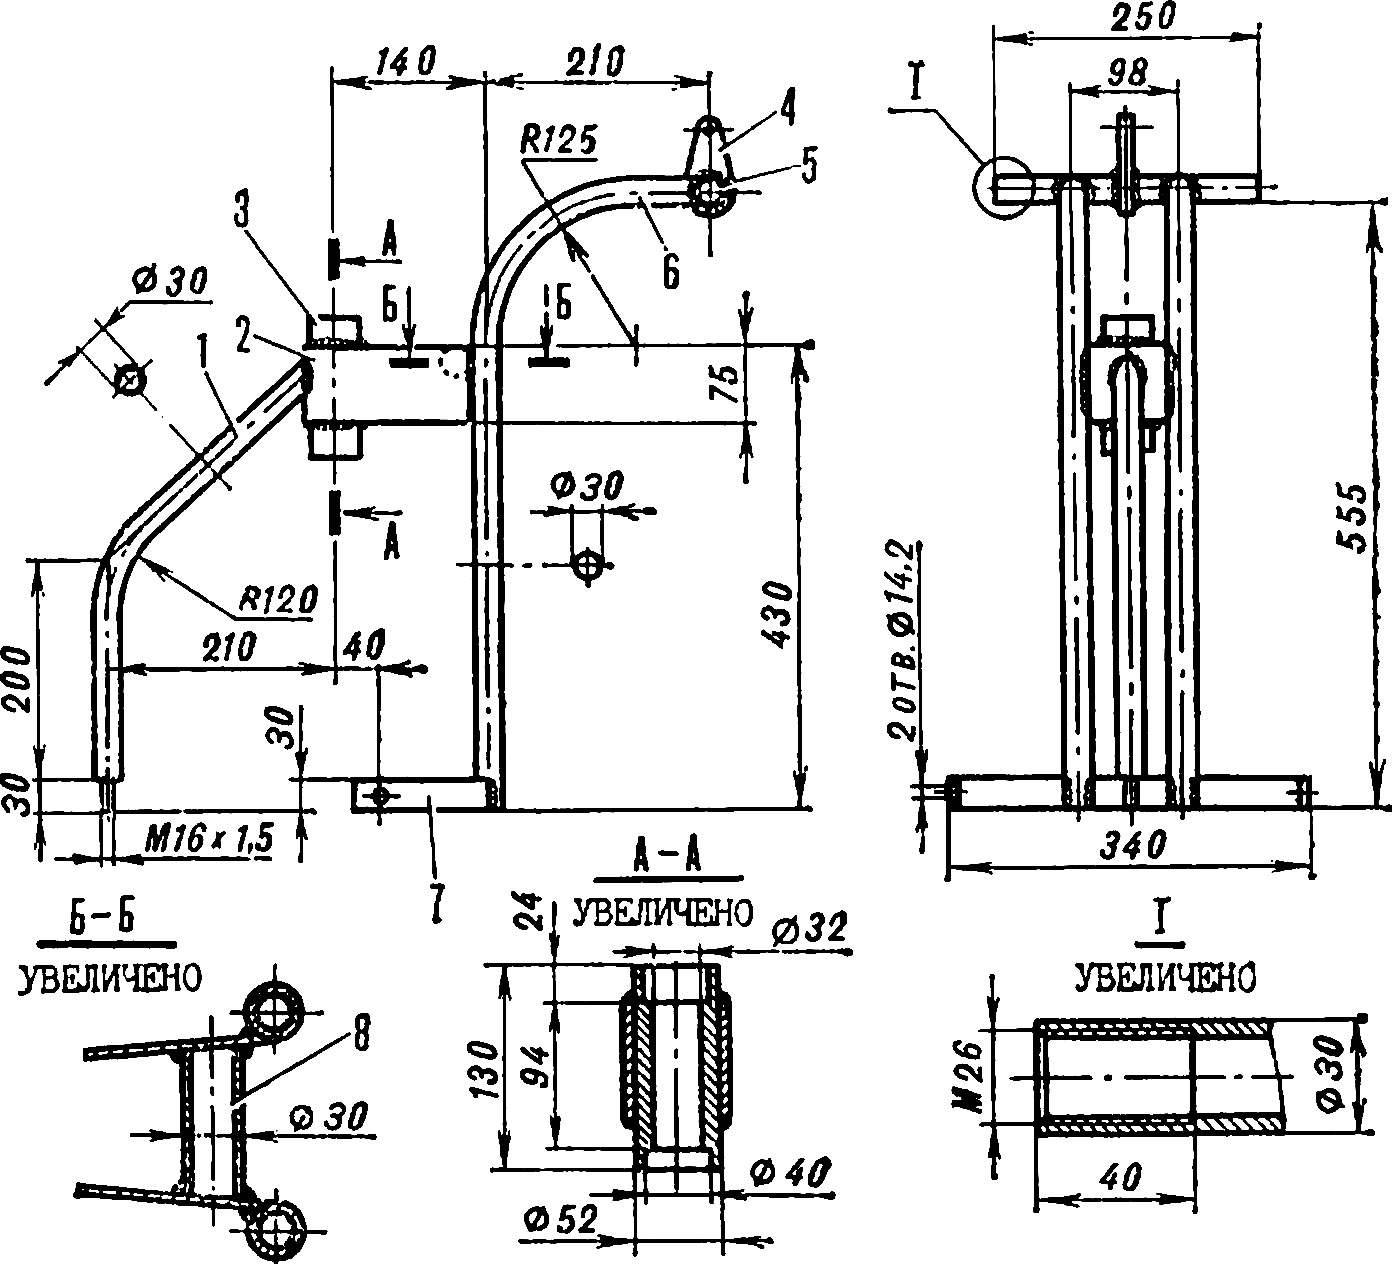 Fig. 3. Swivel hub.